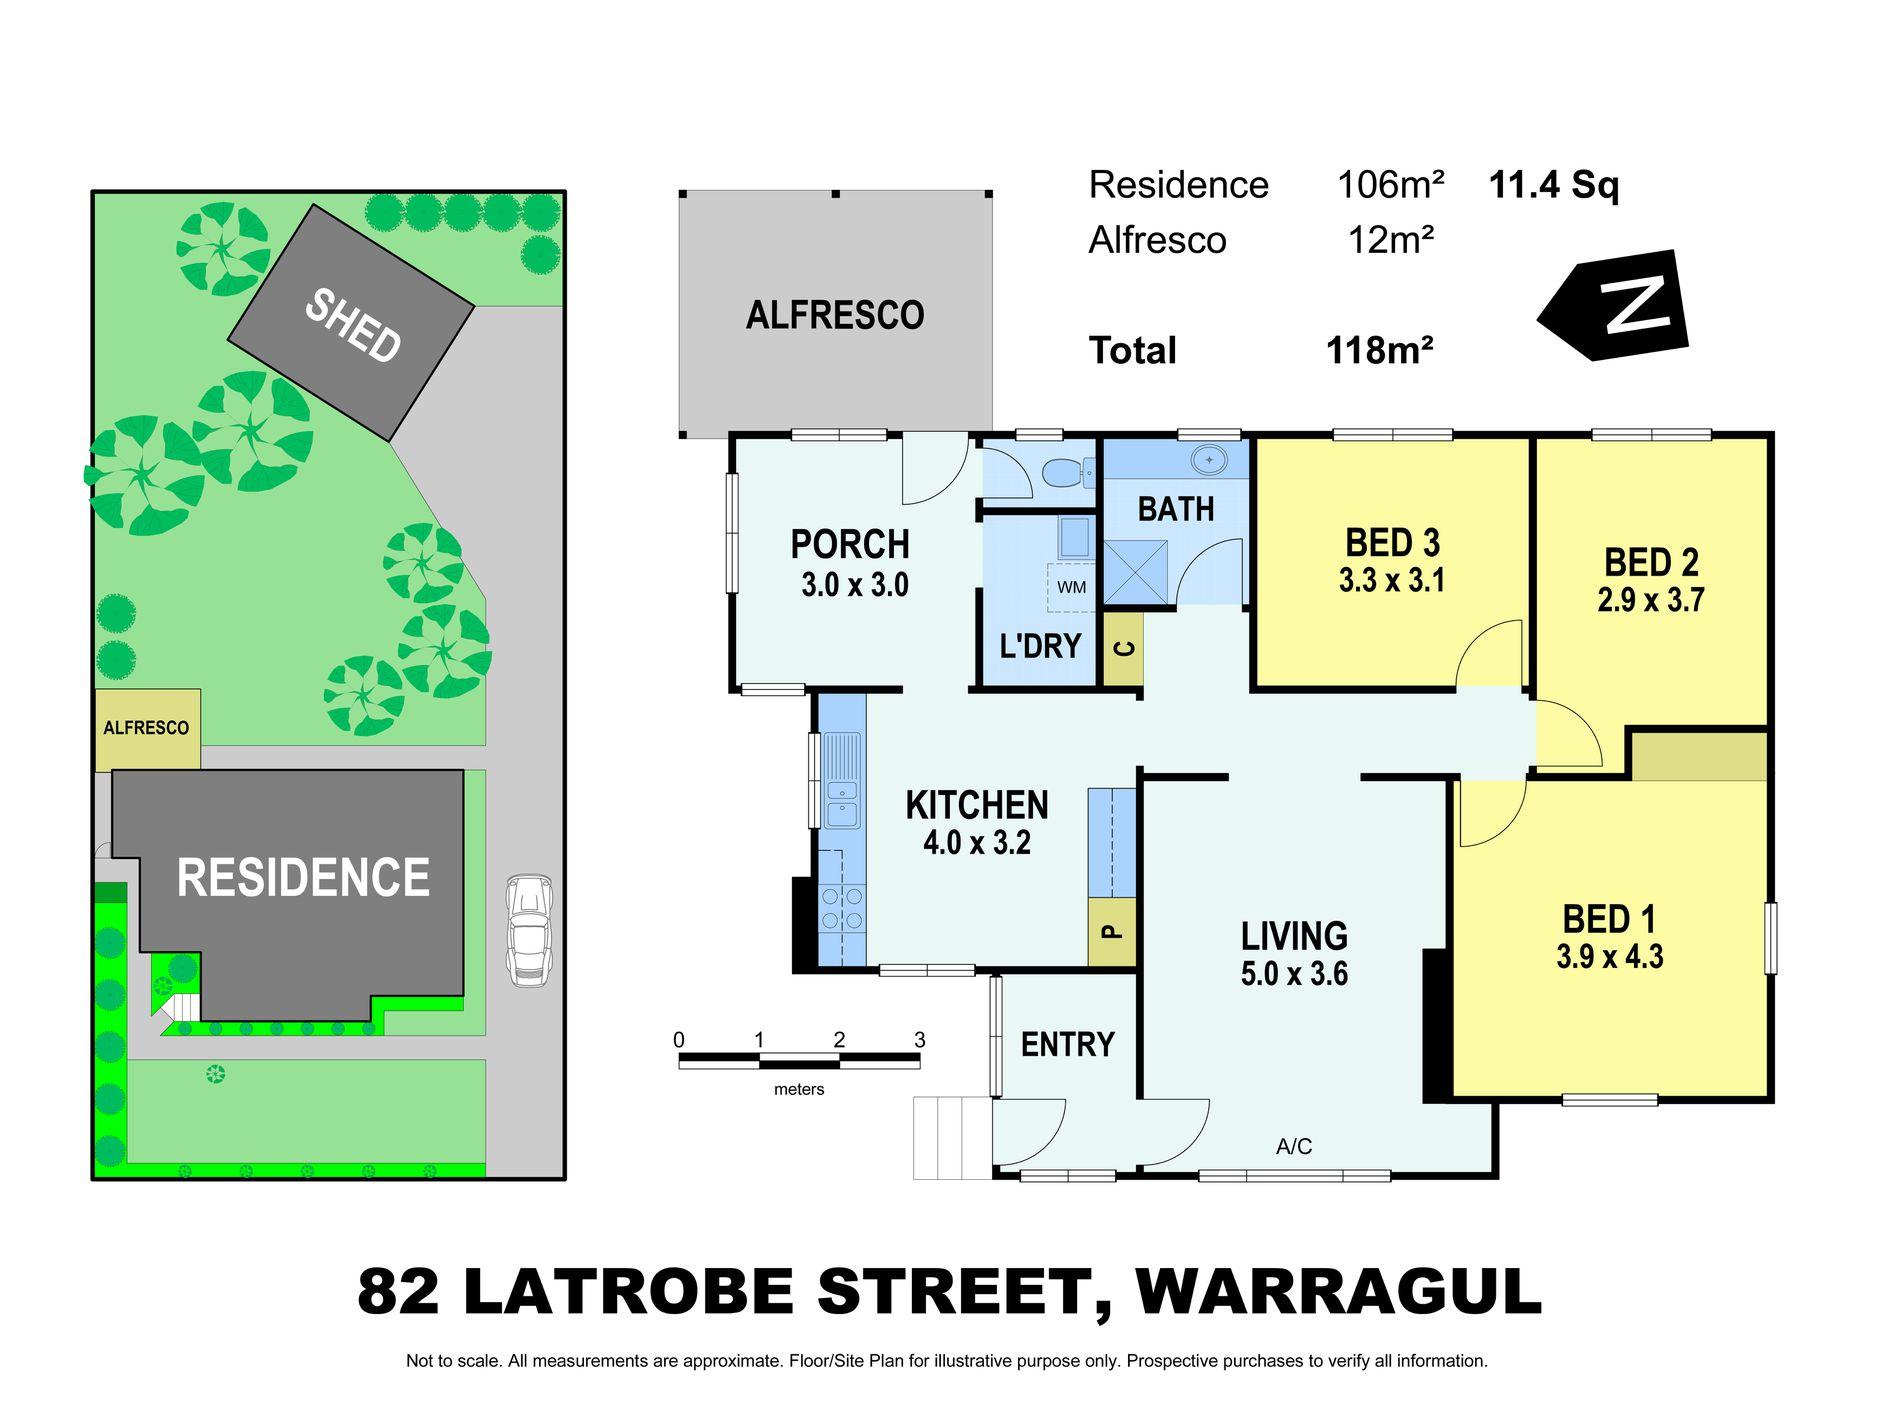 82 Latrobe Street, Warragul